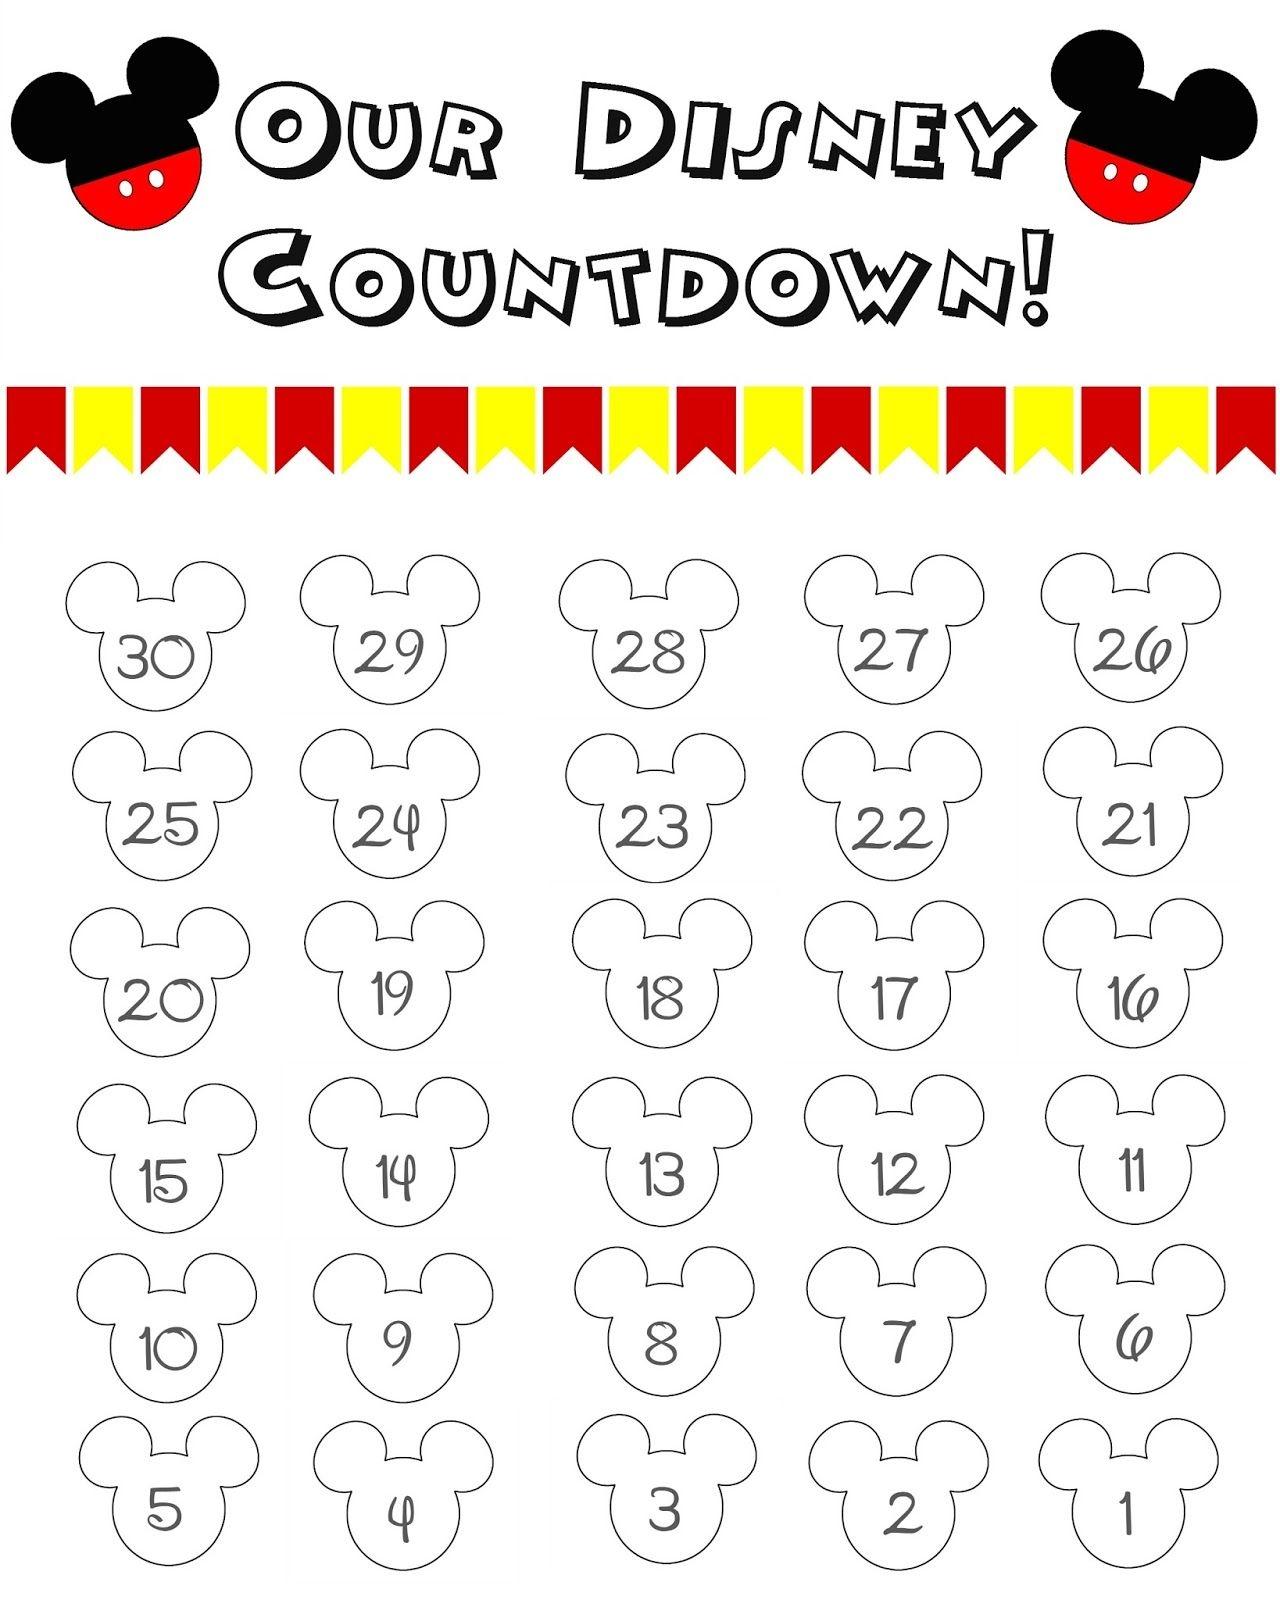 Disney World Countdown Calendar Free Printable Disney3abry